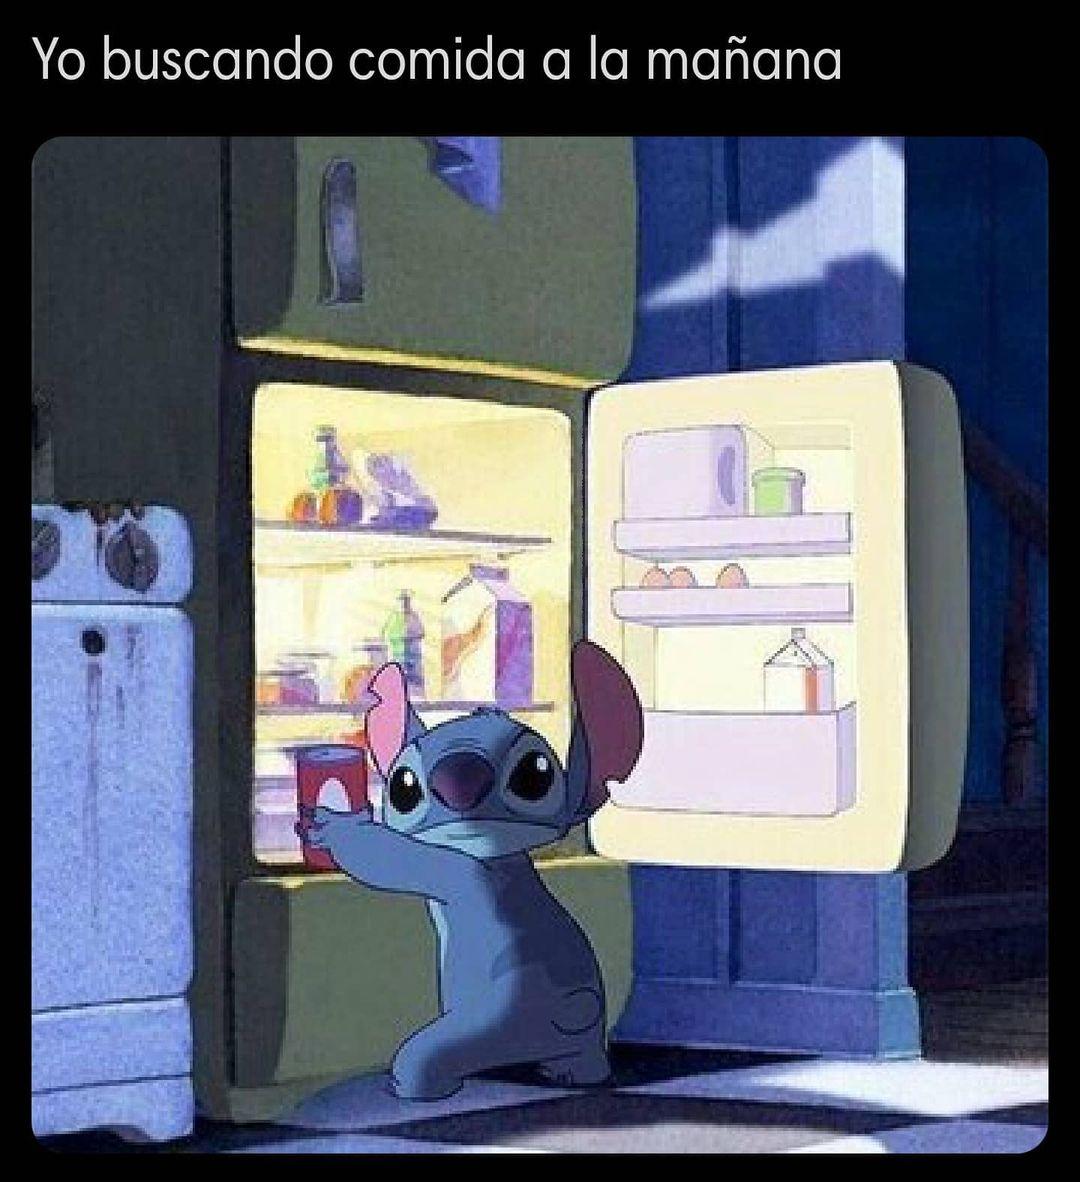 Yo buscando comida a la mañana.